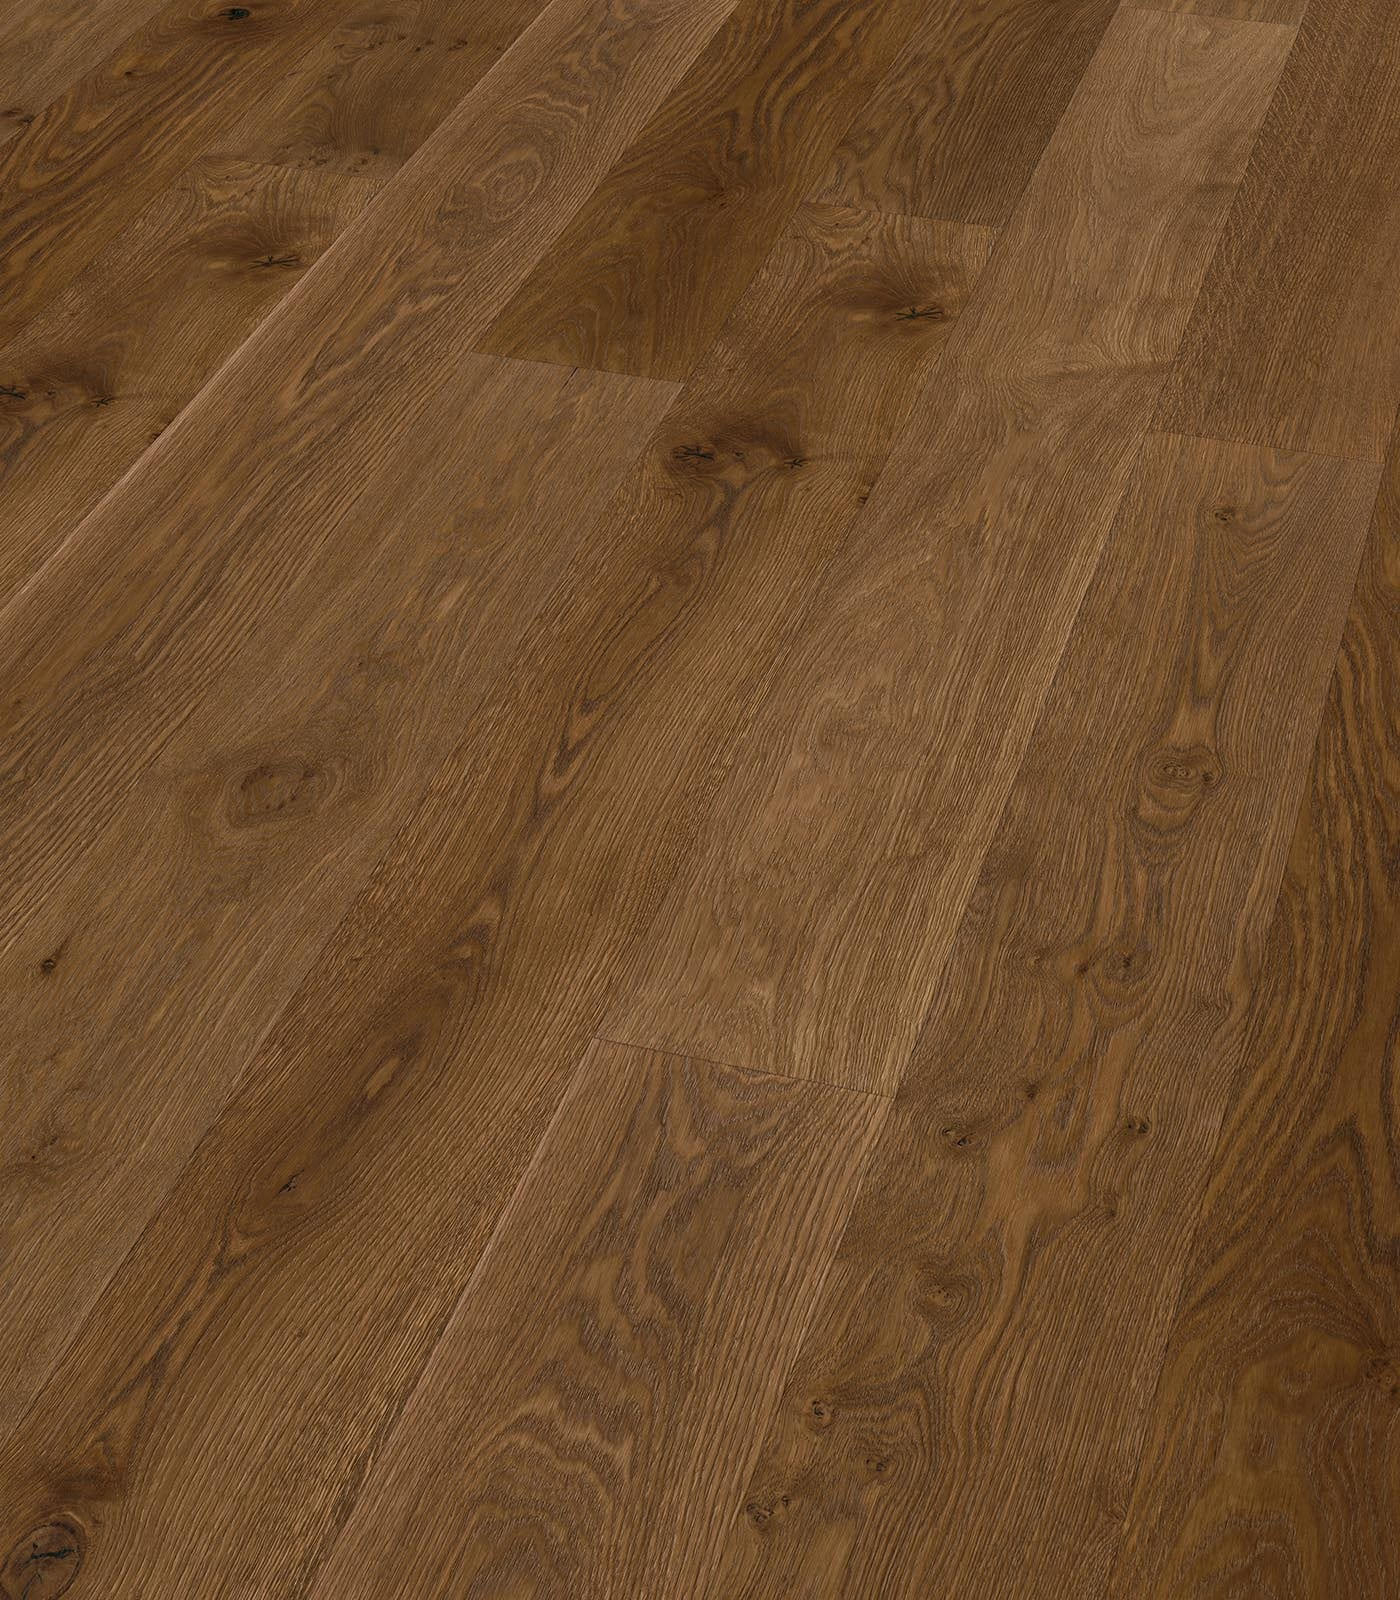 Monterey-Lifestyle Collection-European Oak Floors-angle